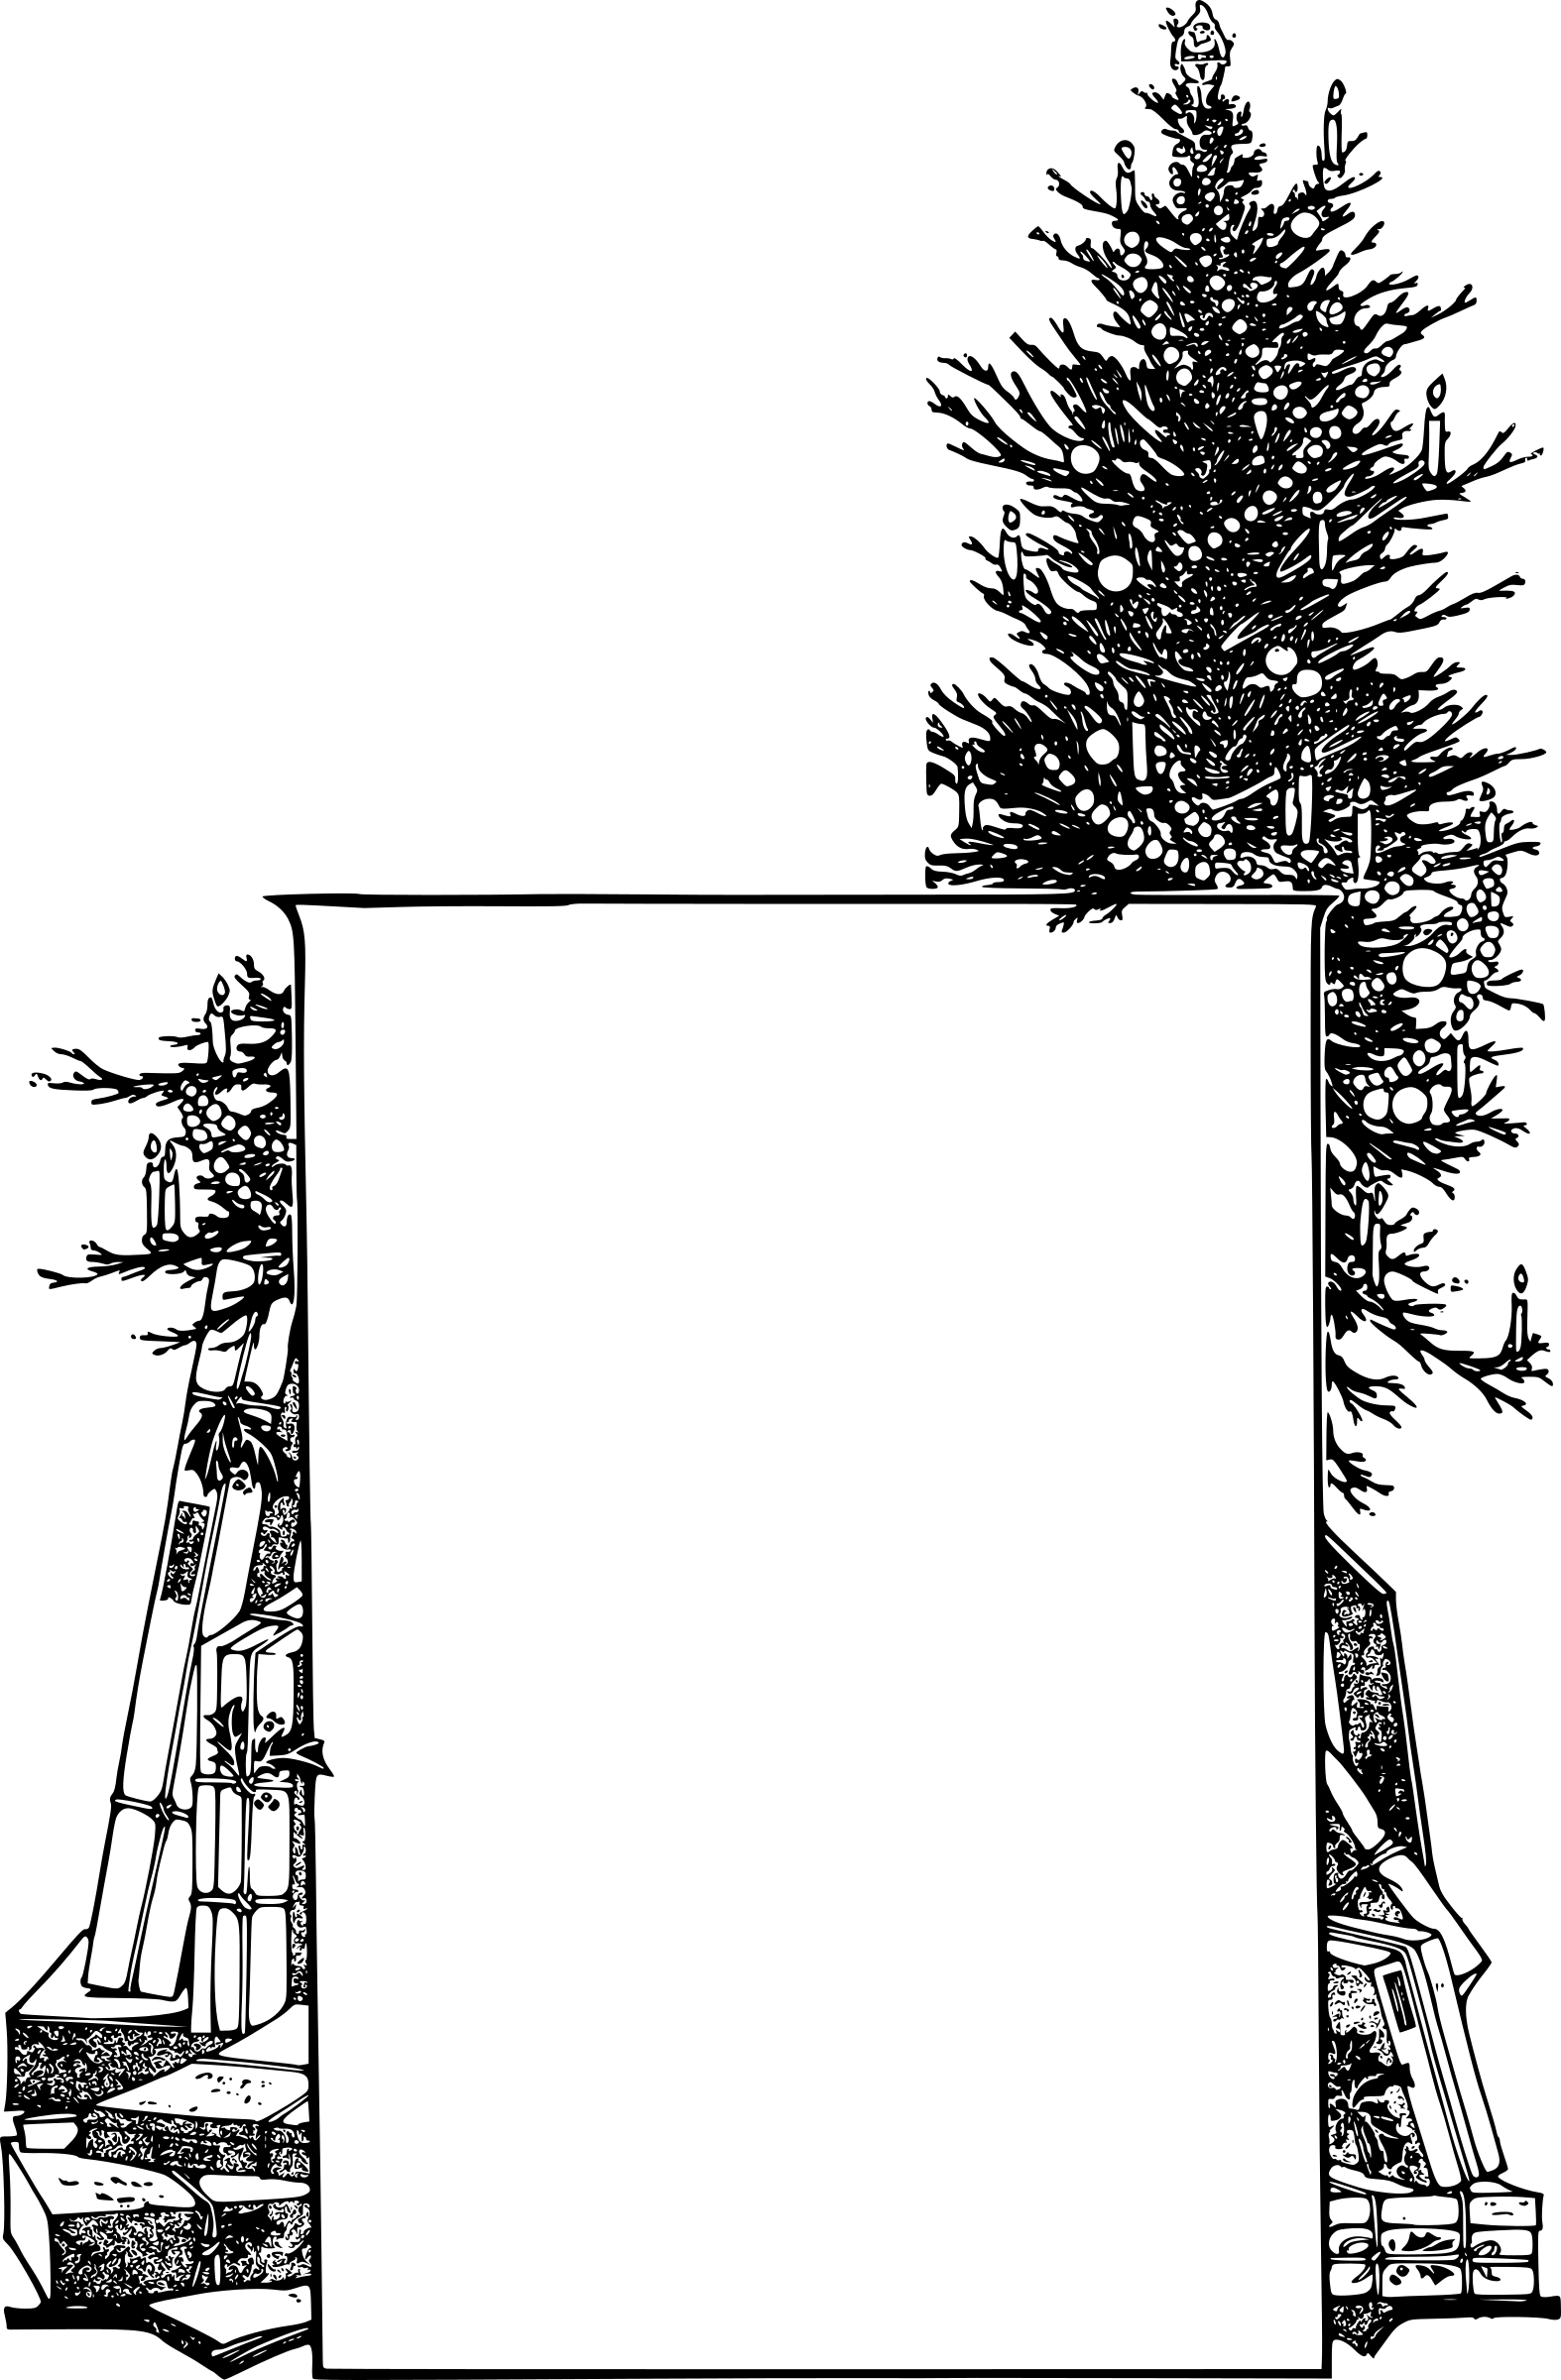 Clipart - Christmas Tree Frame